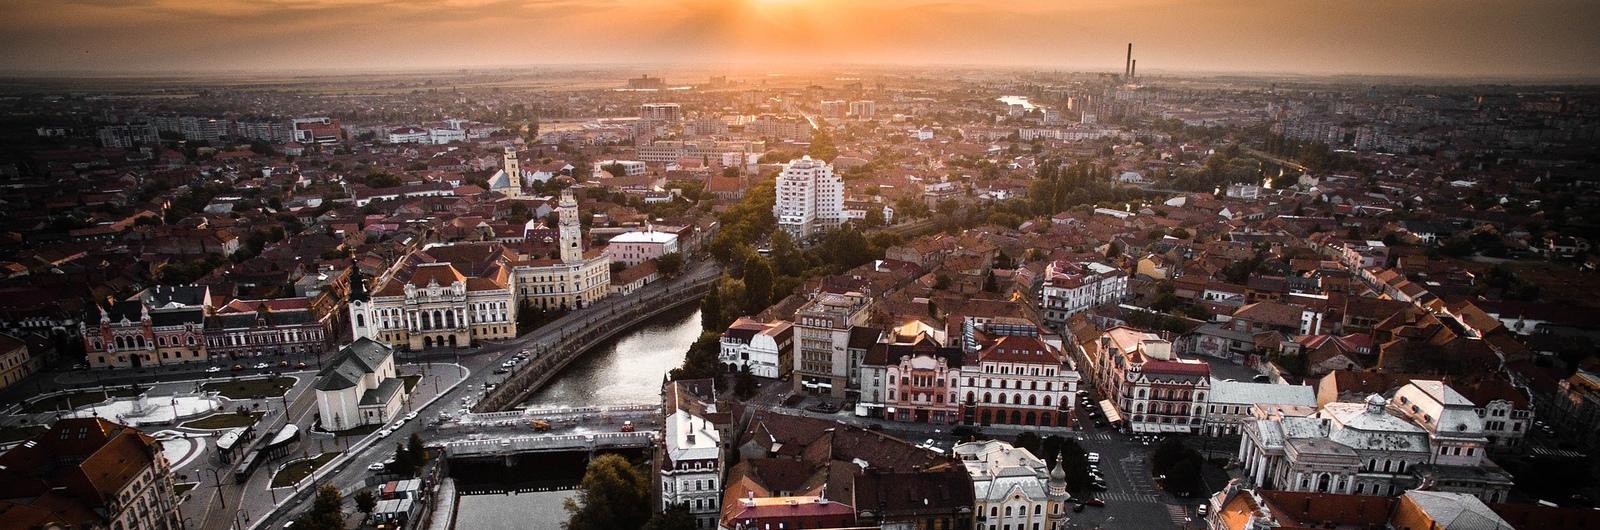 oradea city header